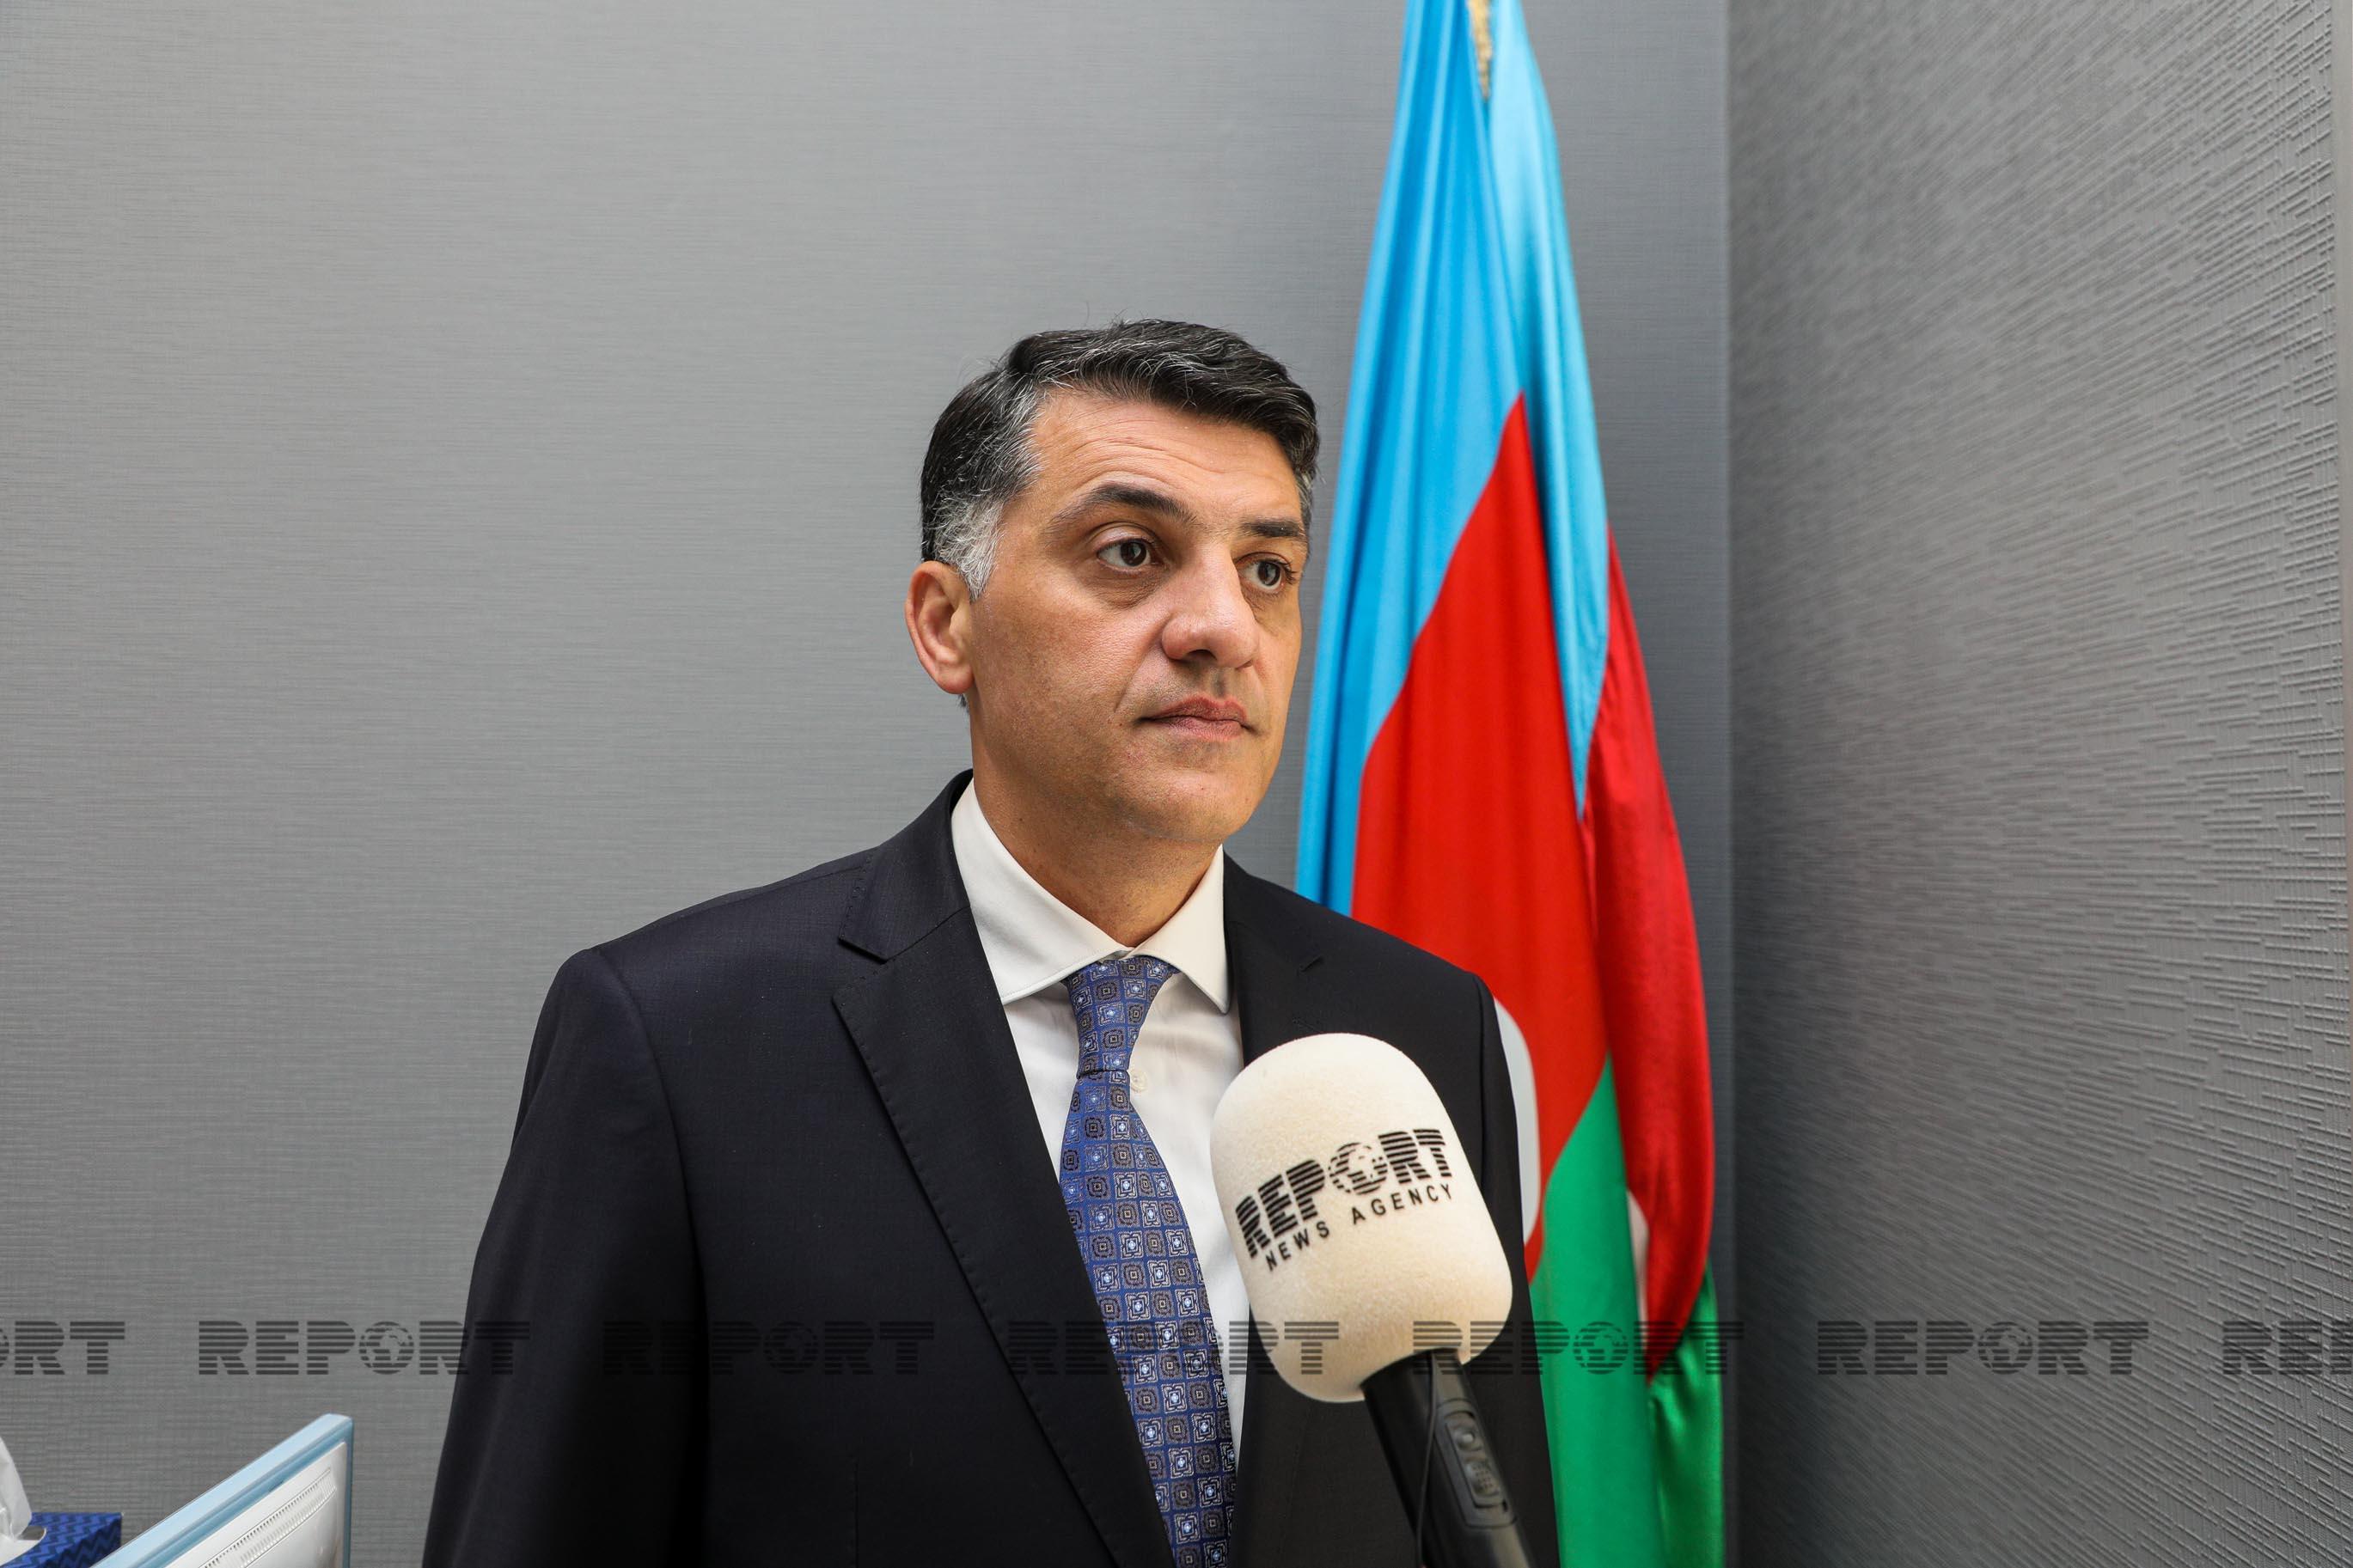 Raqif Abbasov